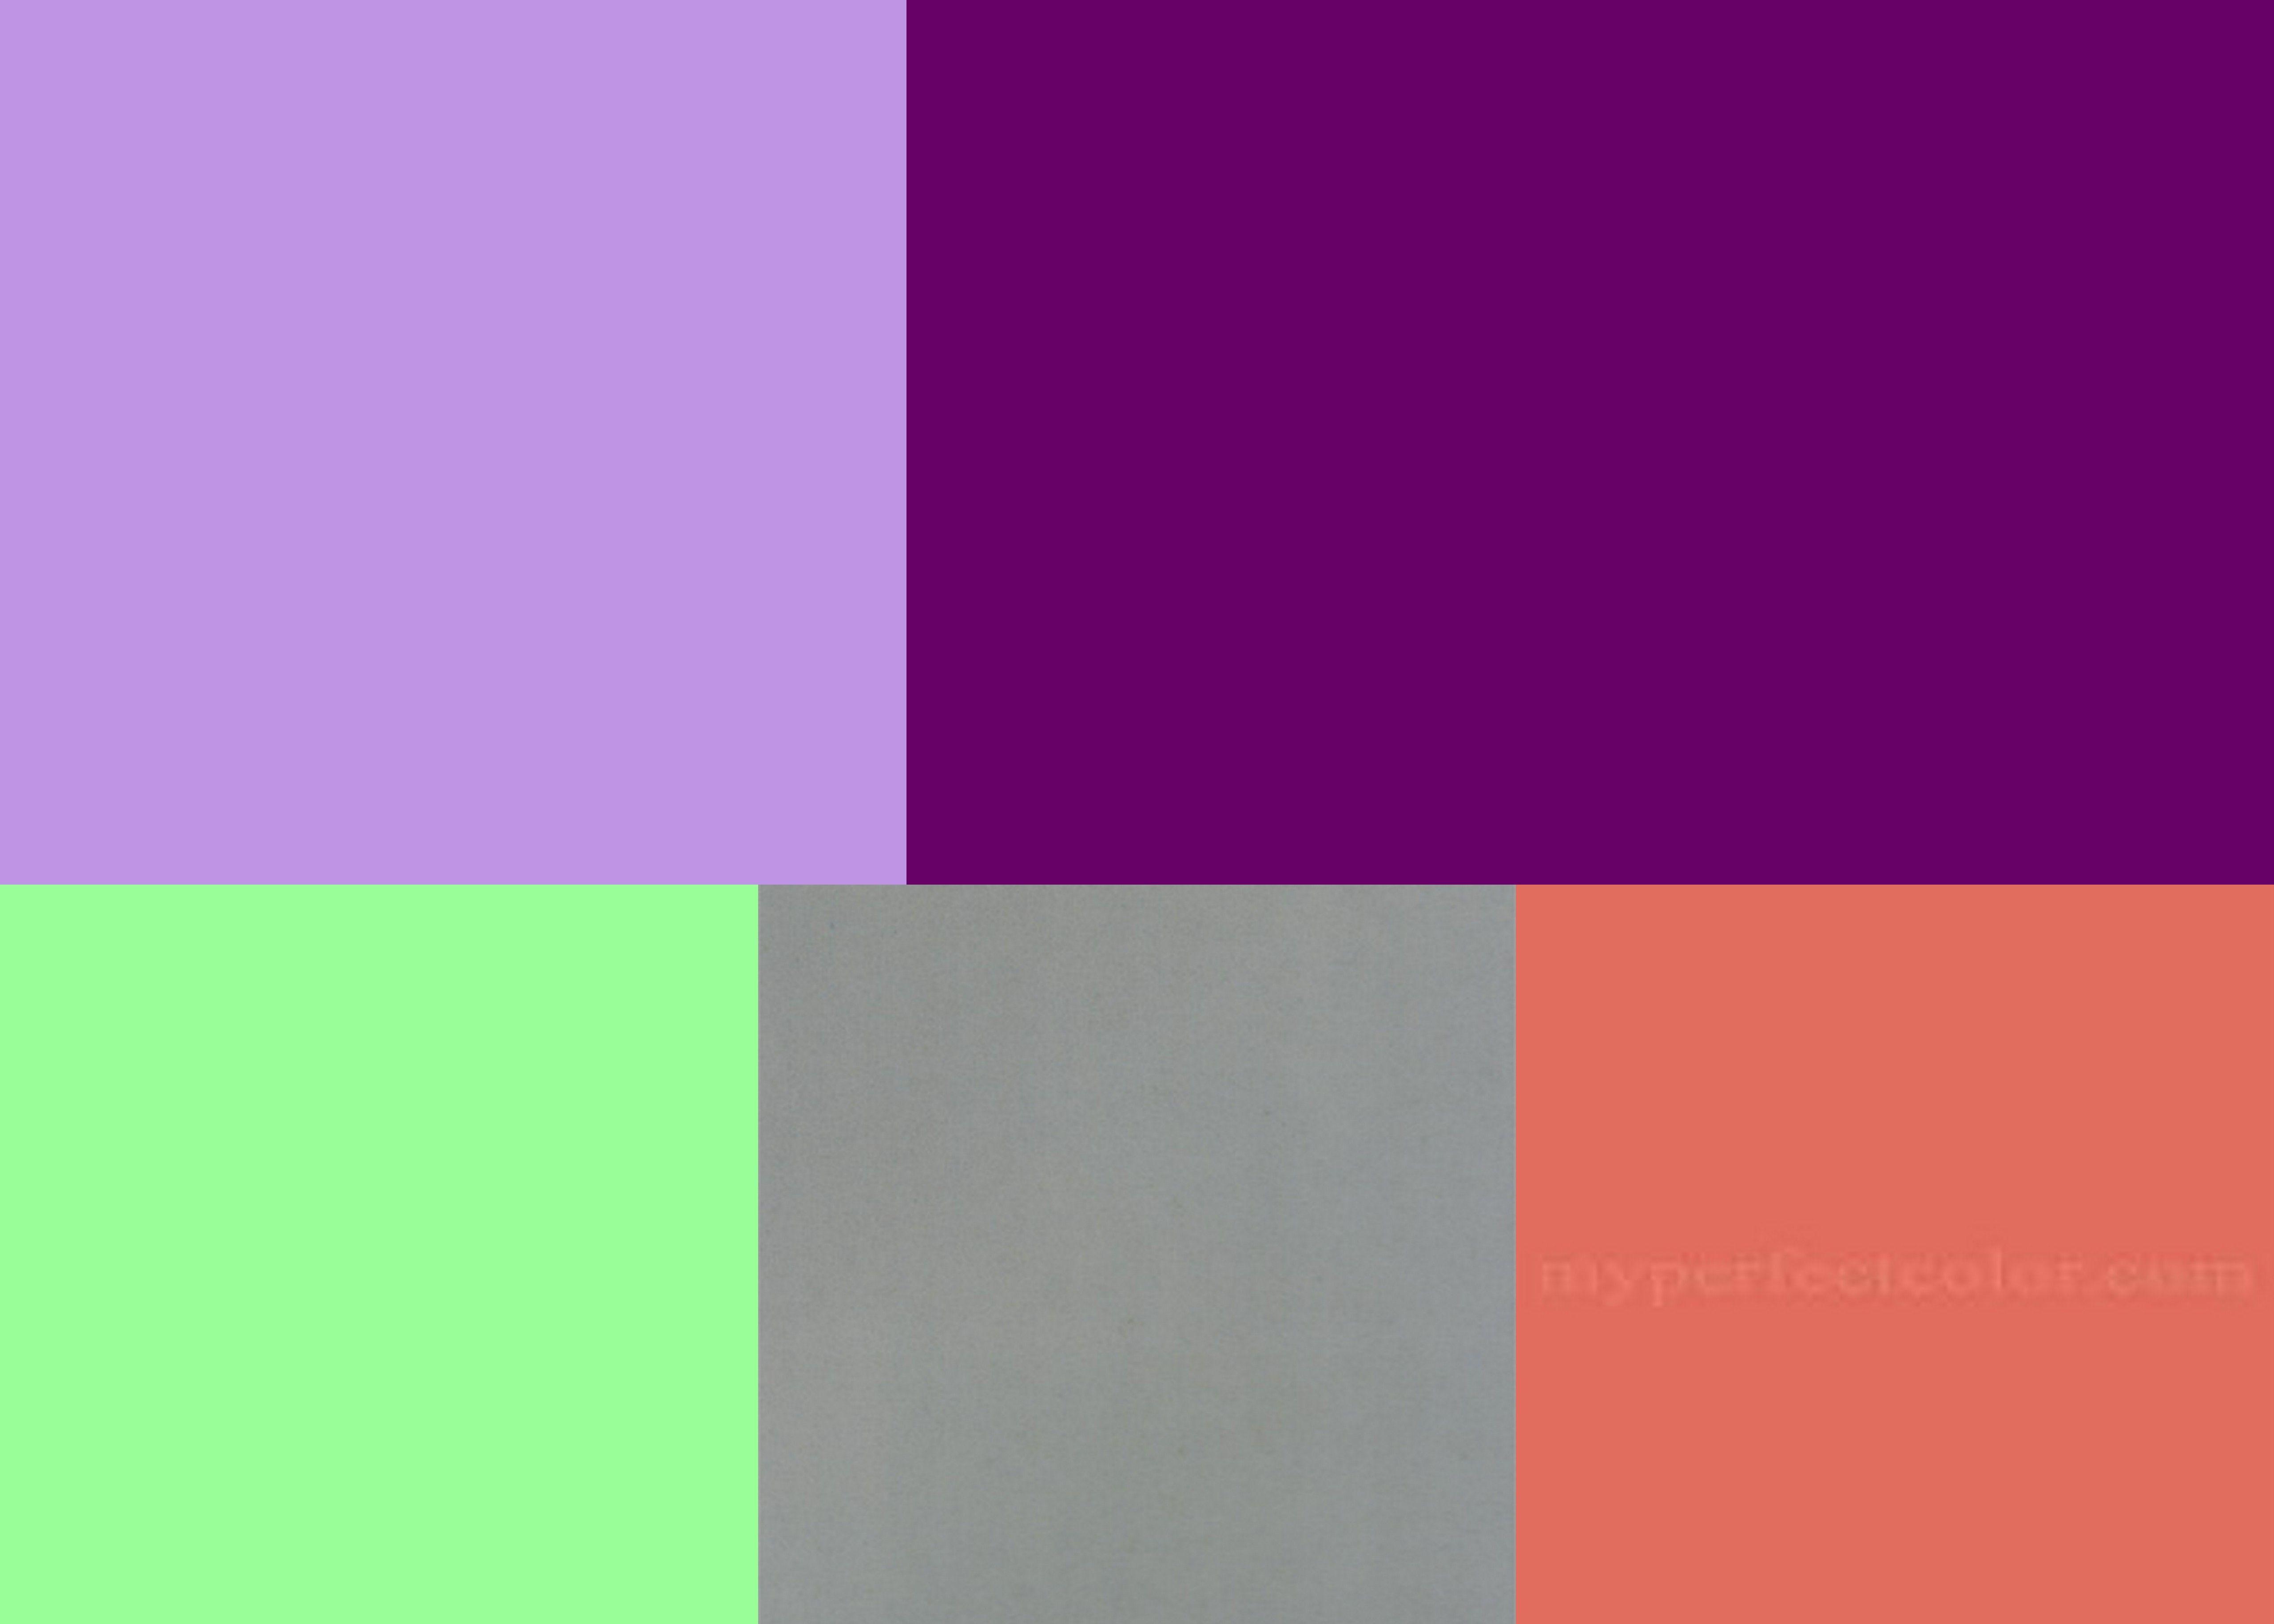 Accent Colors For Green Color Palette Violet Lavender Mint Green Coral Accent